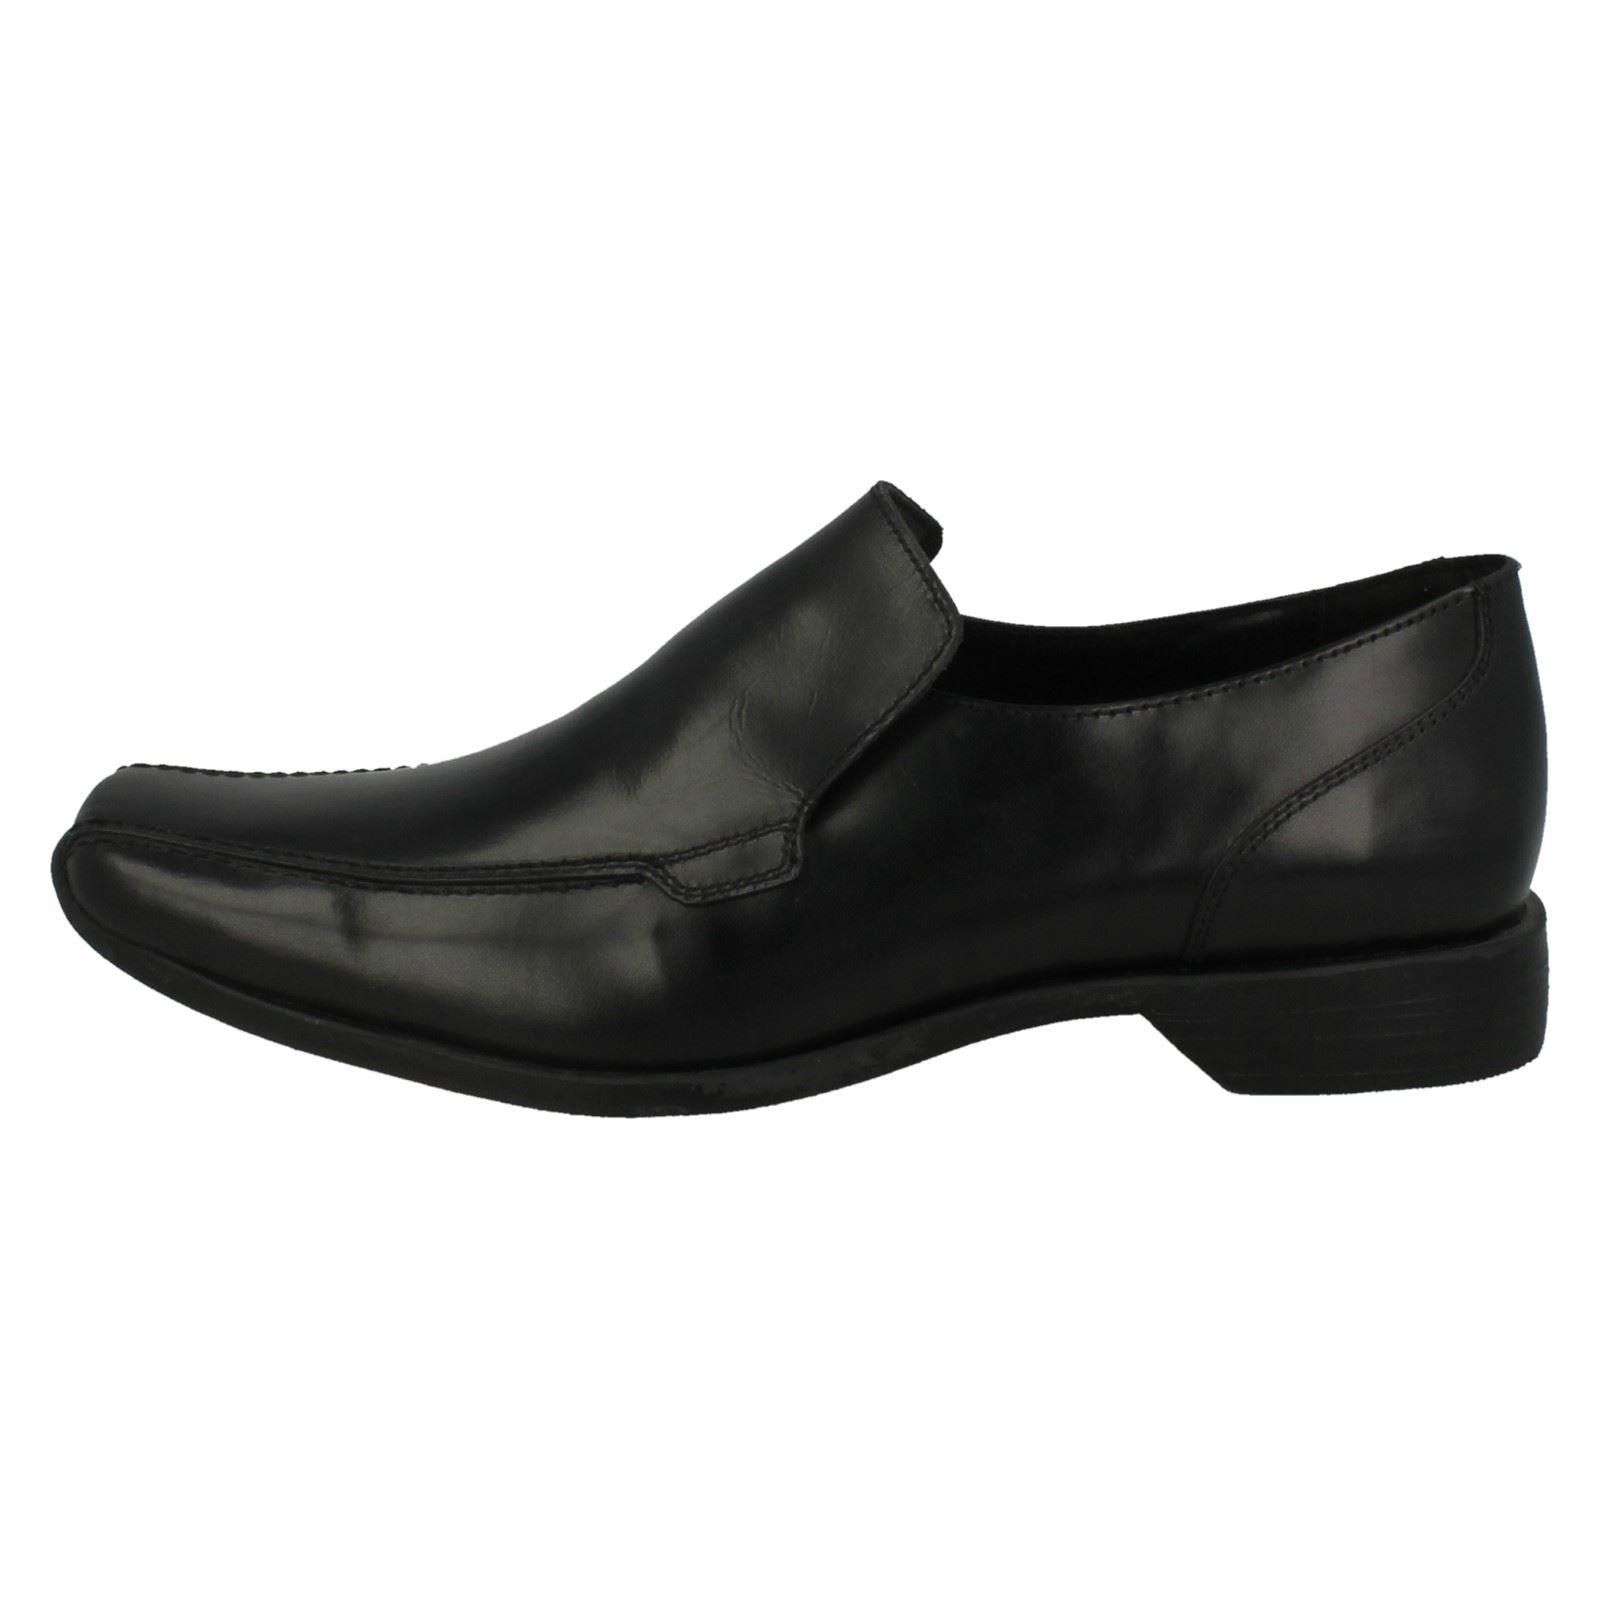 Hommes Bas Habillées' 'chaussures Maverick Talon rYwPqrU